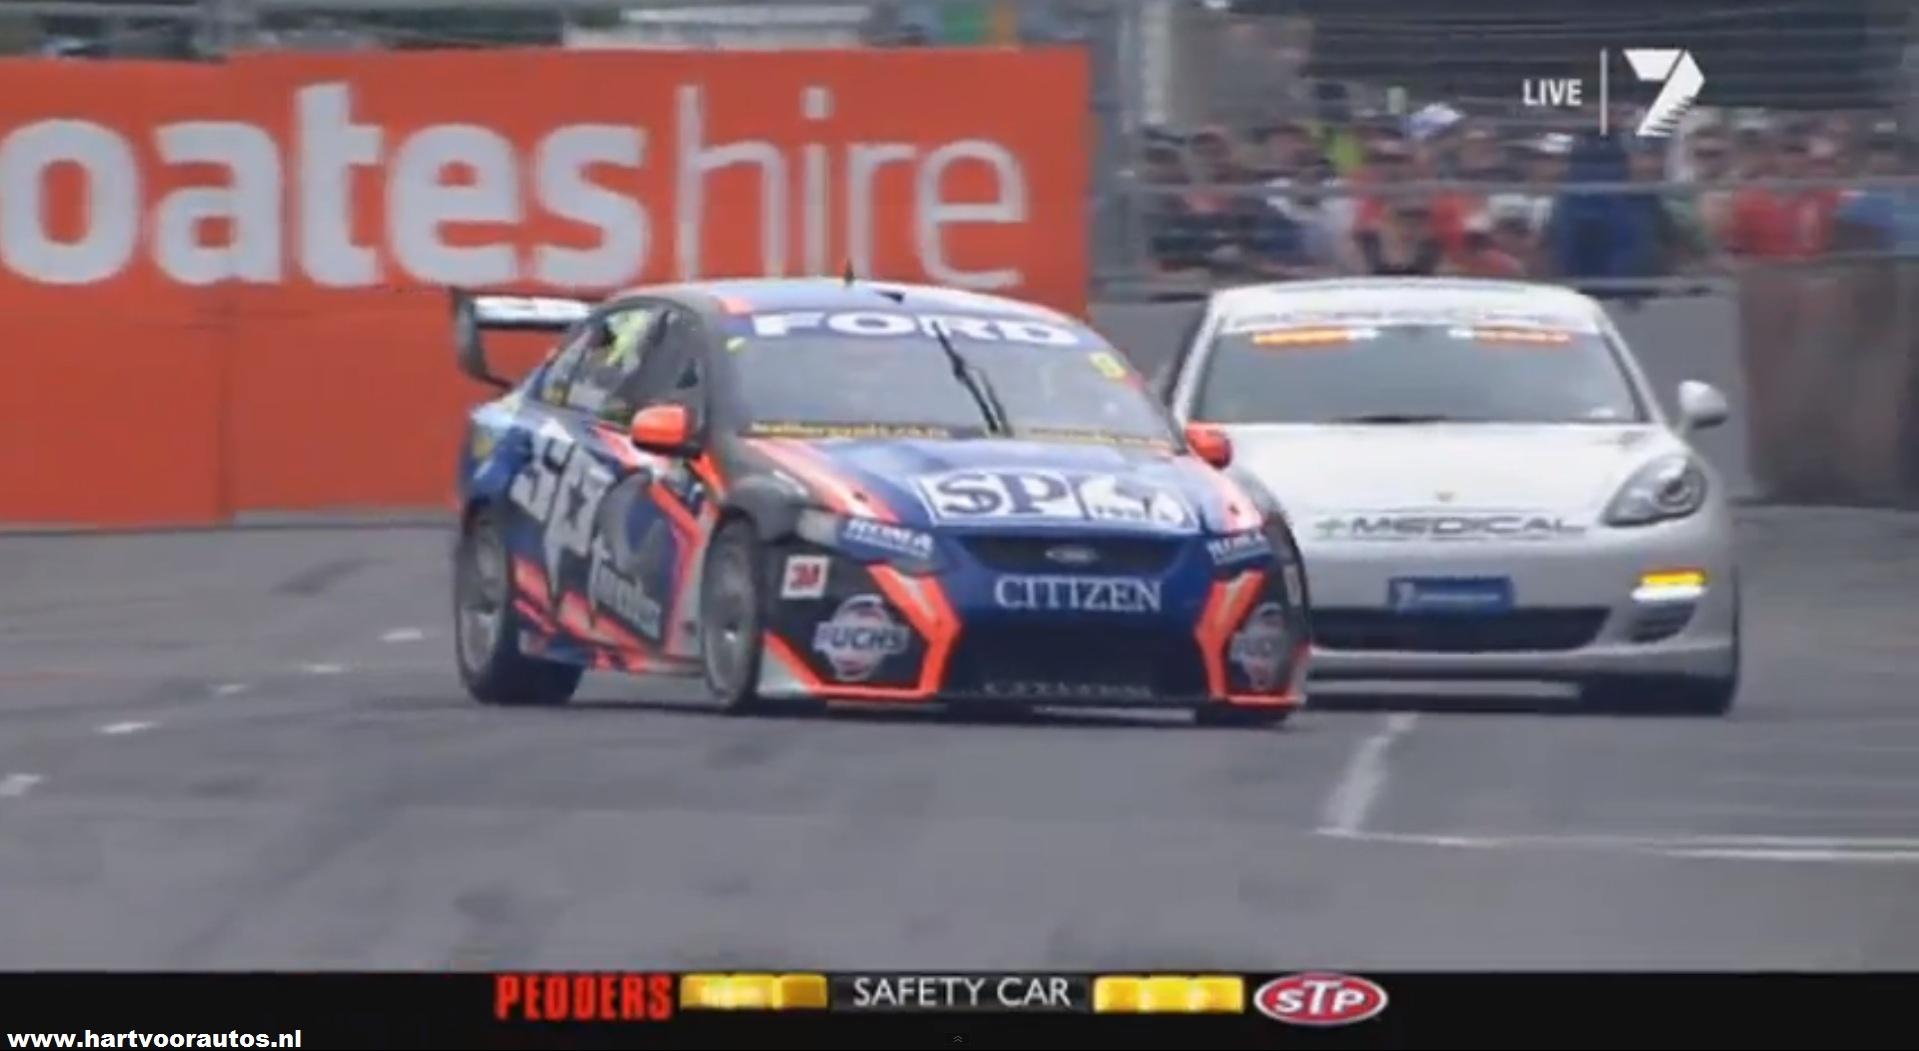 2012 Sydney Telstra 500 - Shane Van Gisbergen Hits the Porsche Panamera Medical Car - www.hartvoorautos.nl